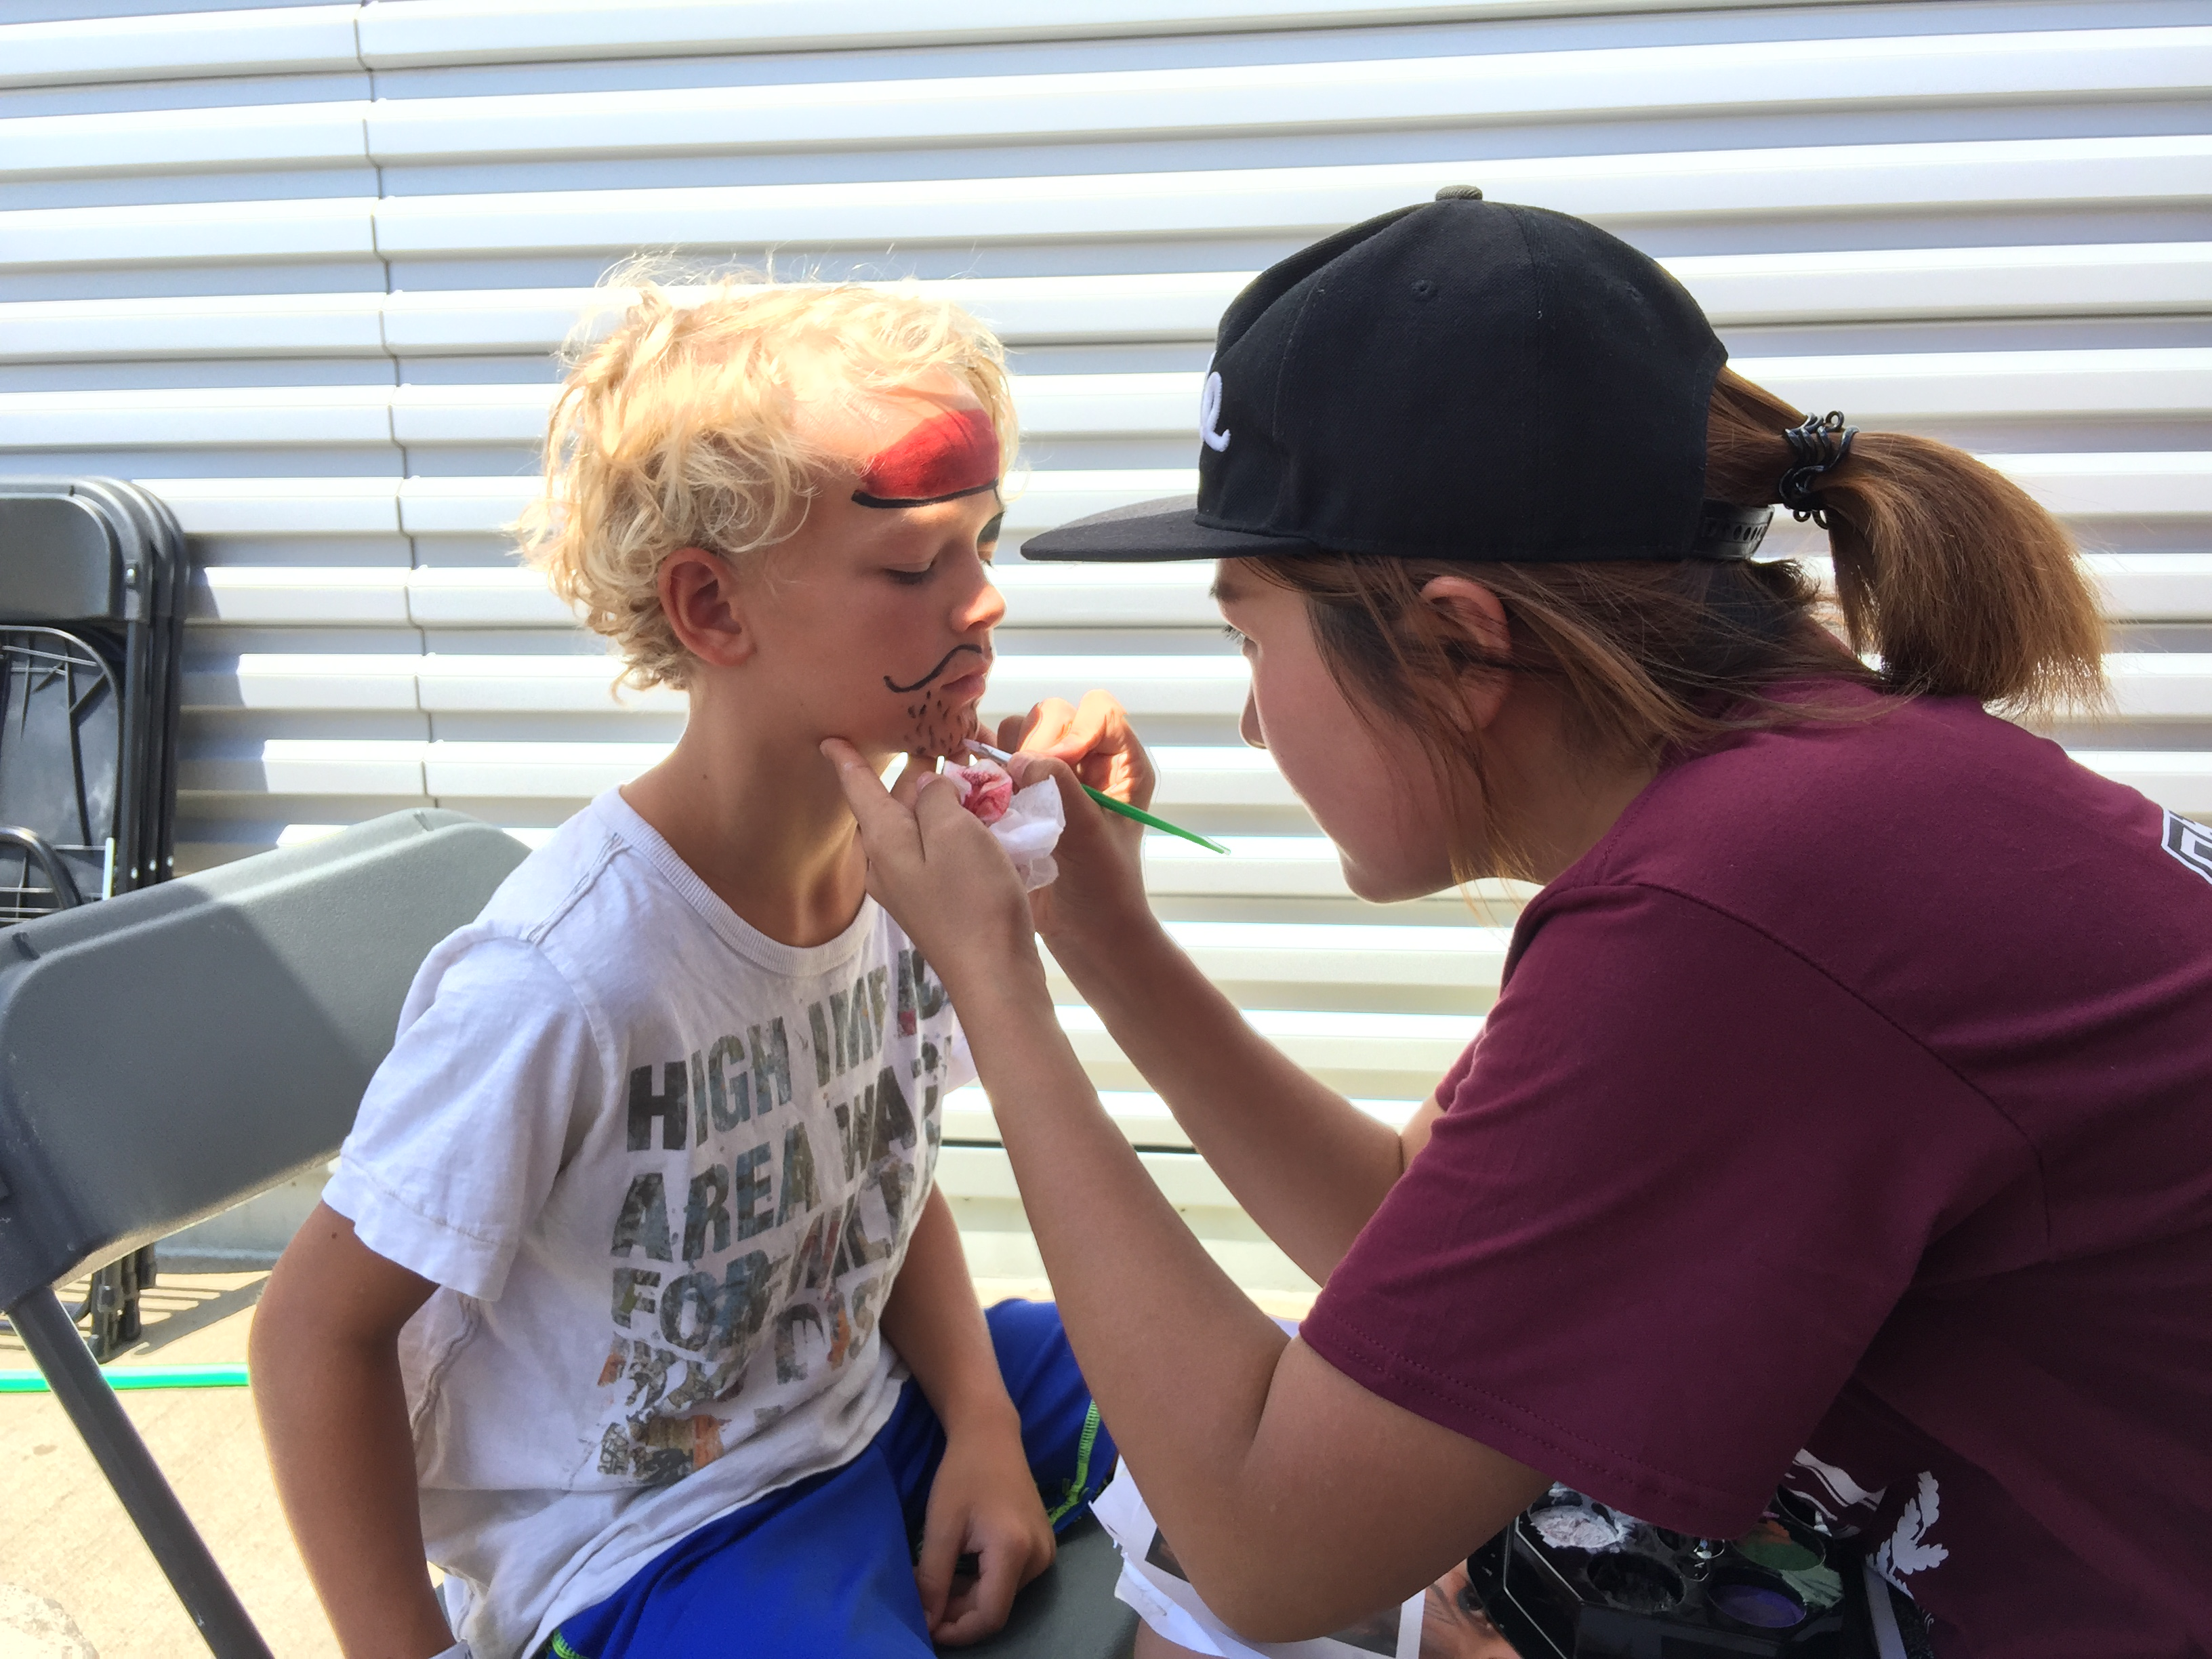 志愿者正在做Face Painting